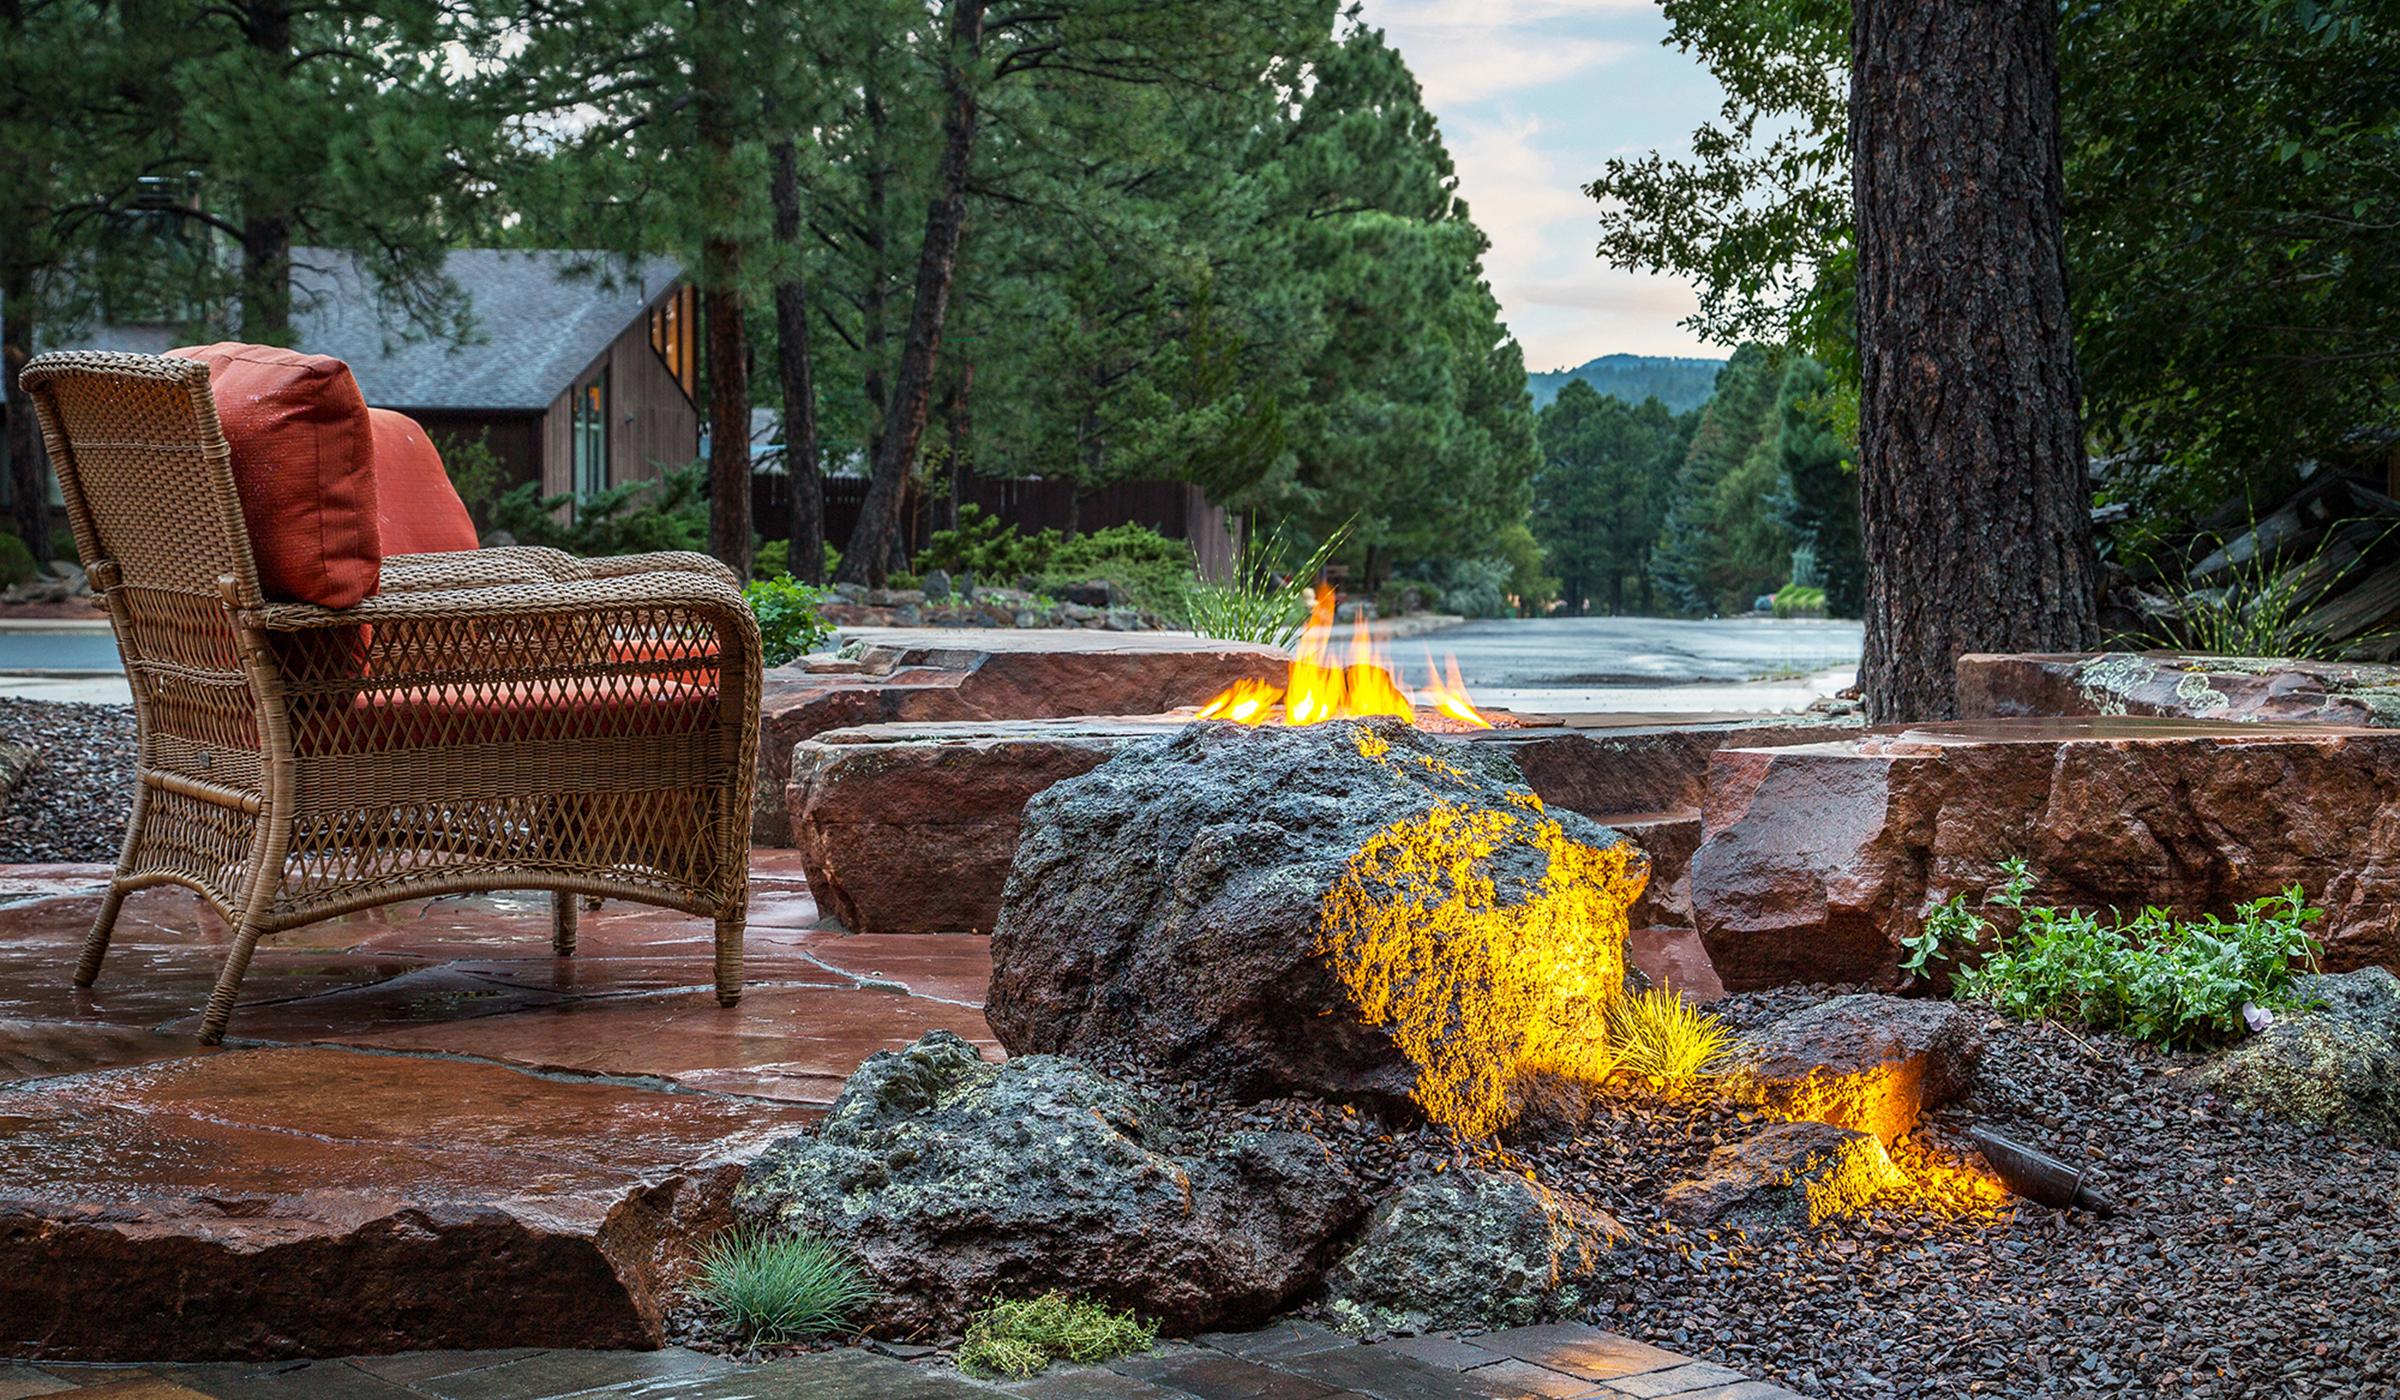 Flagstaff Landscape Design fire pit